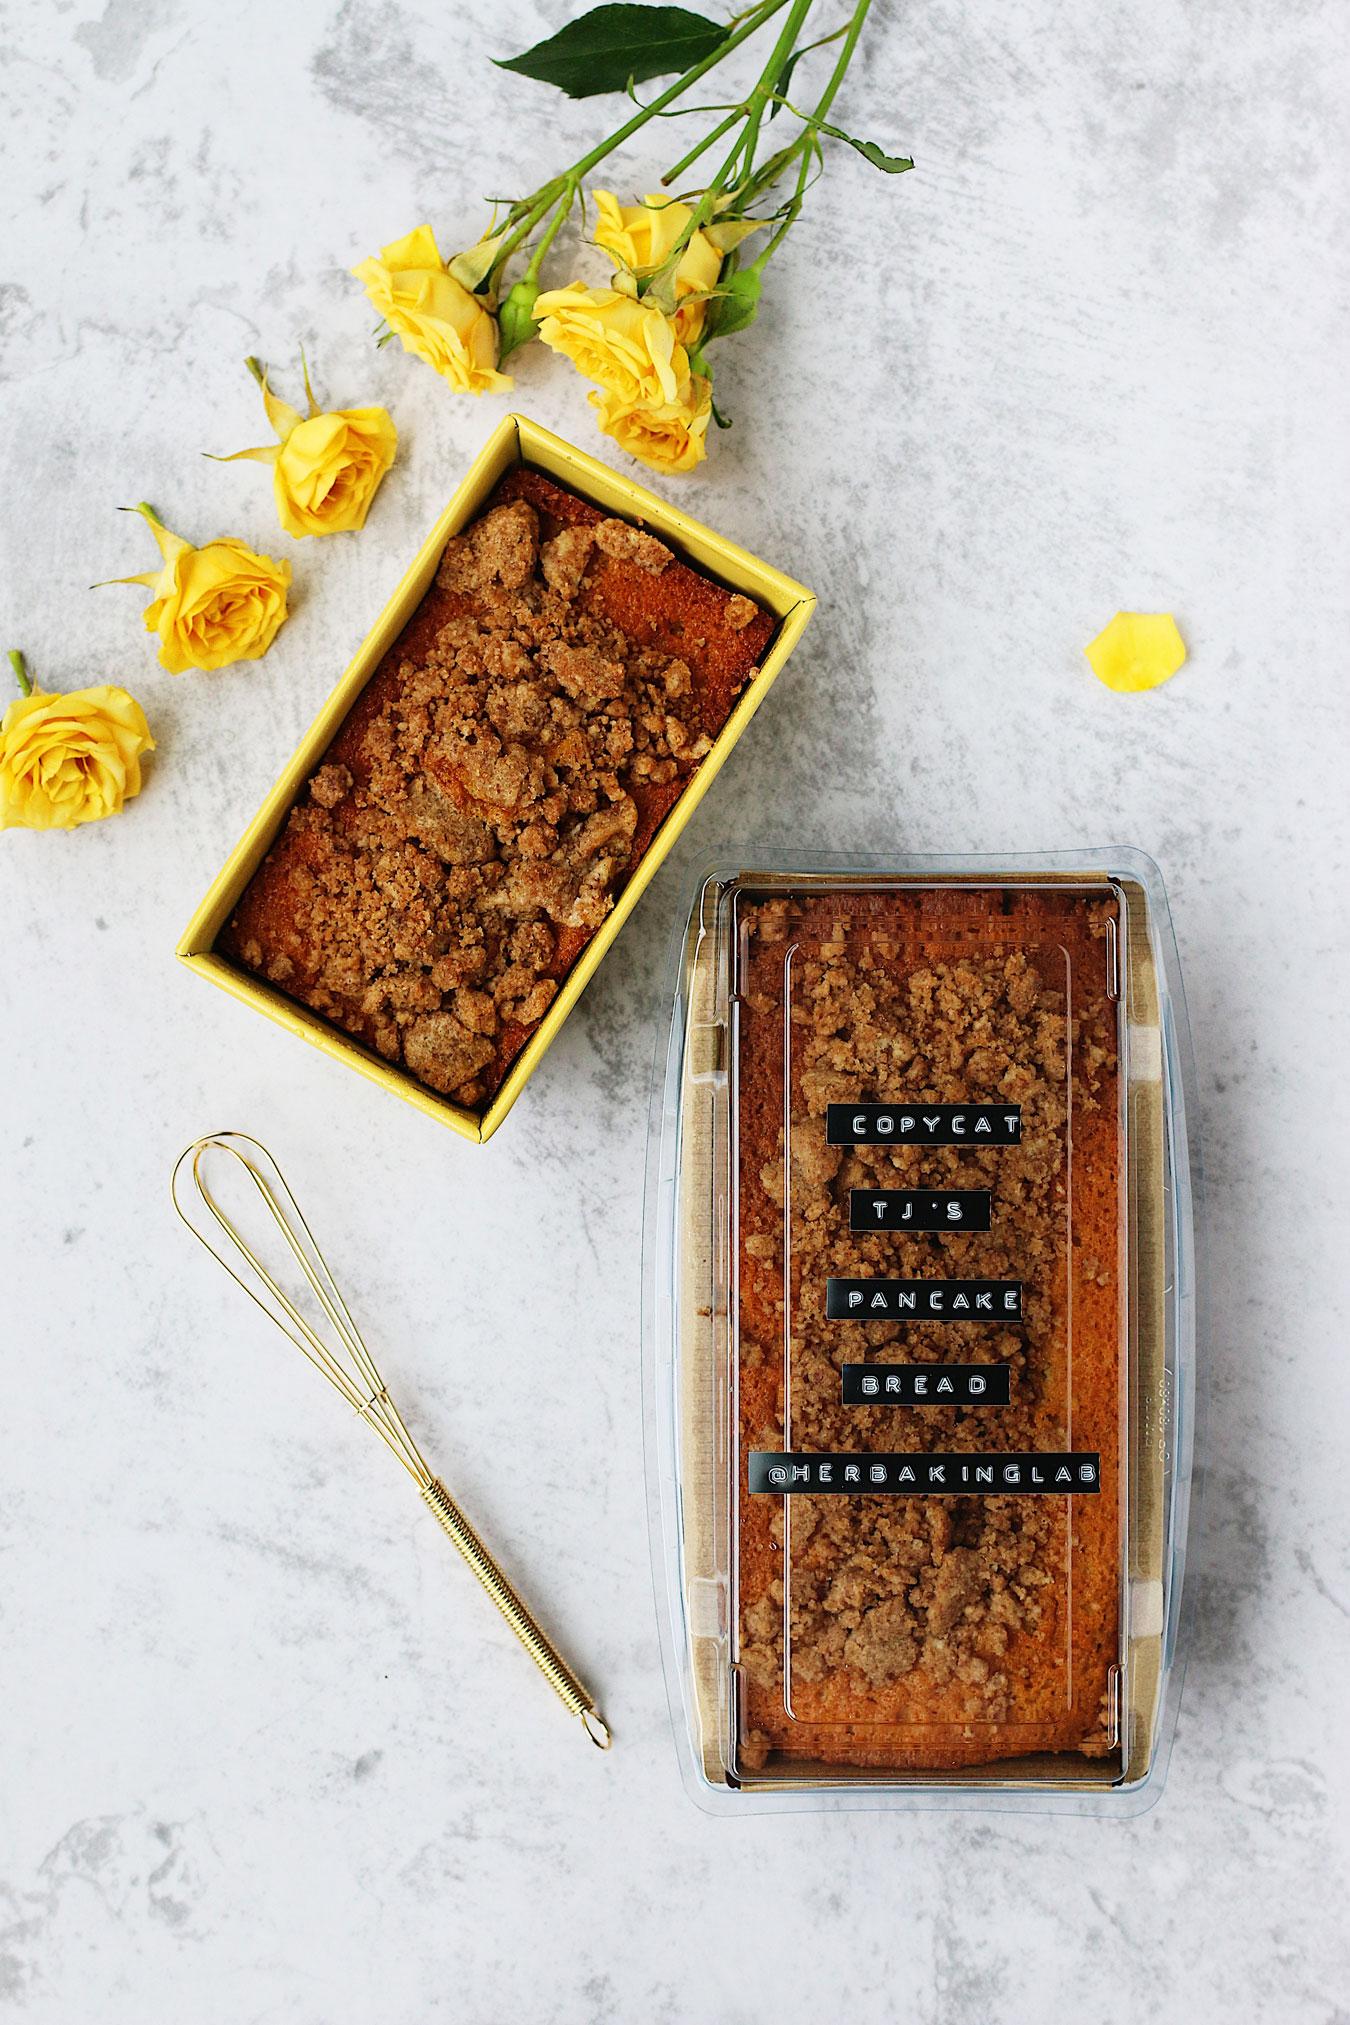 herbakinglab-copycat-trader-joe's-pancake-bread-recipe-two